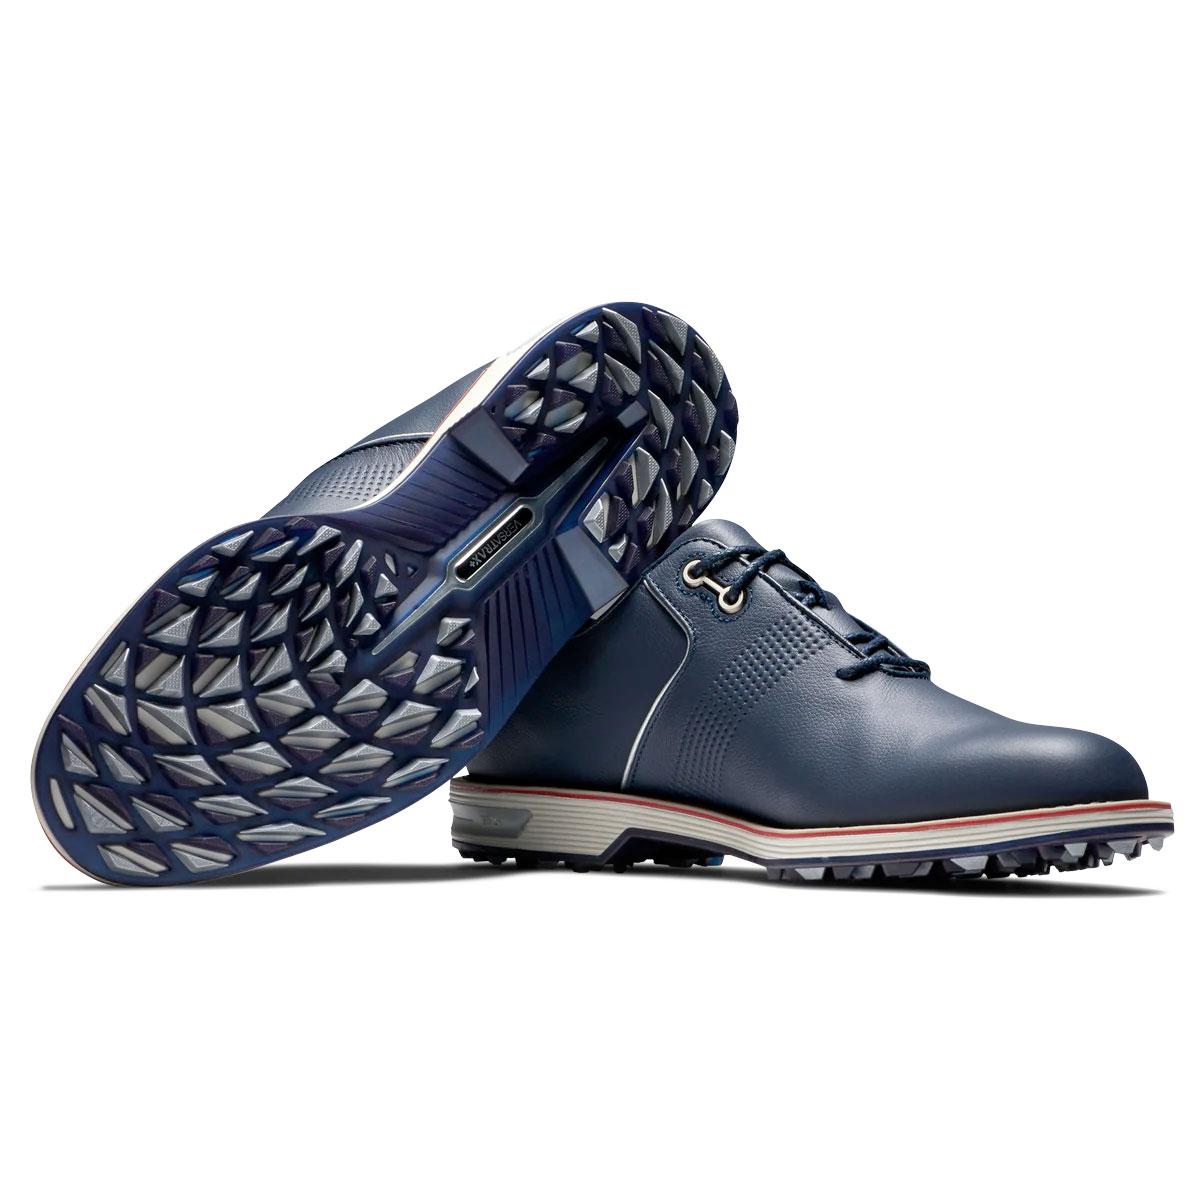 FootJoy Dryjoys Premiere Series Flint Mens Spikeless Golf Shoes  - Navy/Red